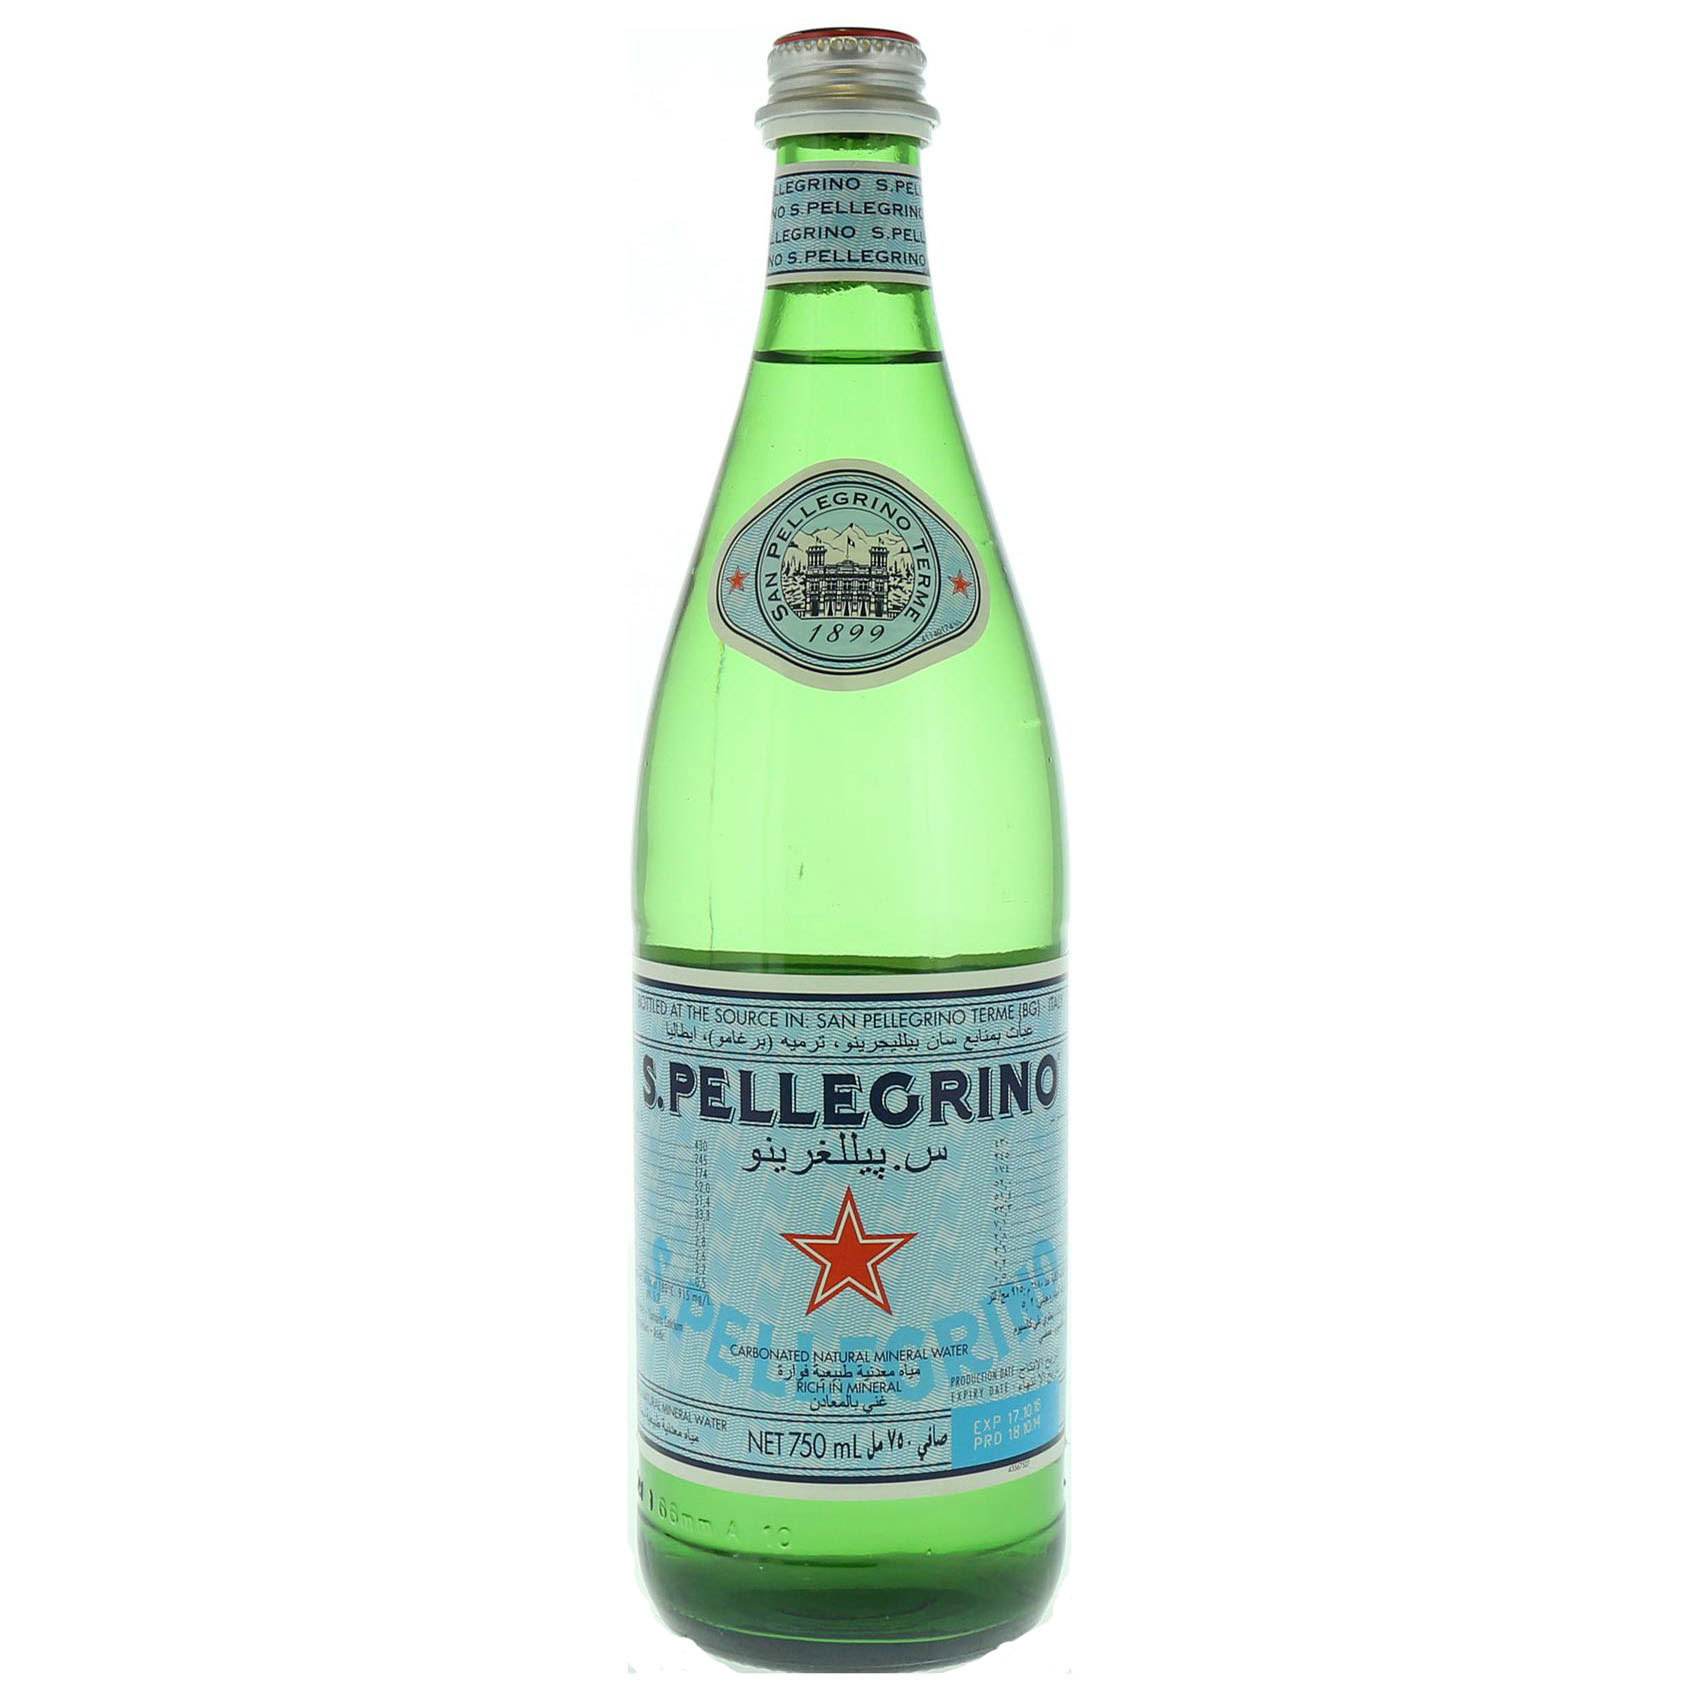 SAN PELLIGRINO SPARKLING WATER750GR